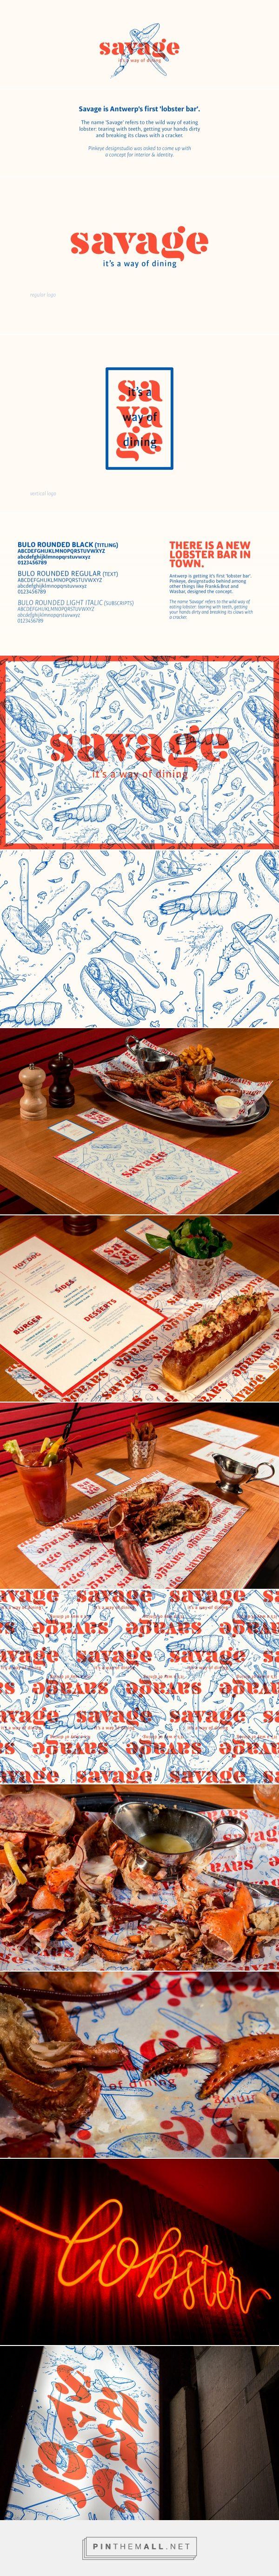 SAVAGE lobster restaurant on Behance - created via https://pinthemall.net